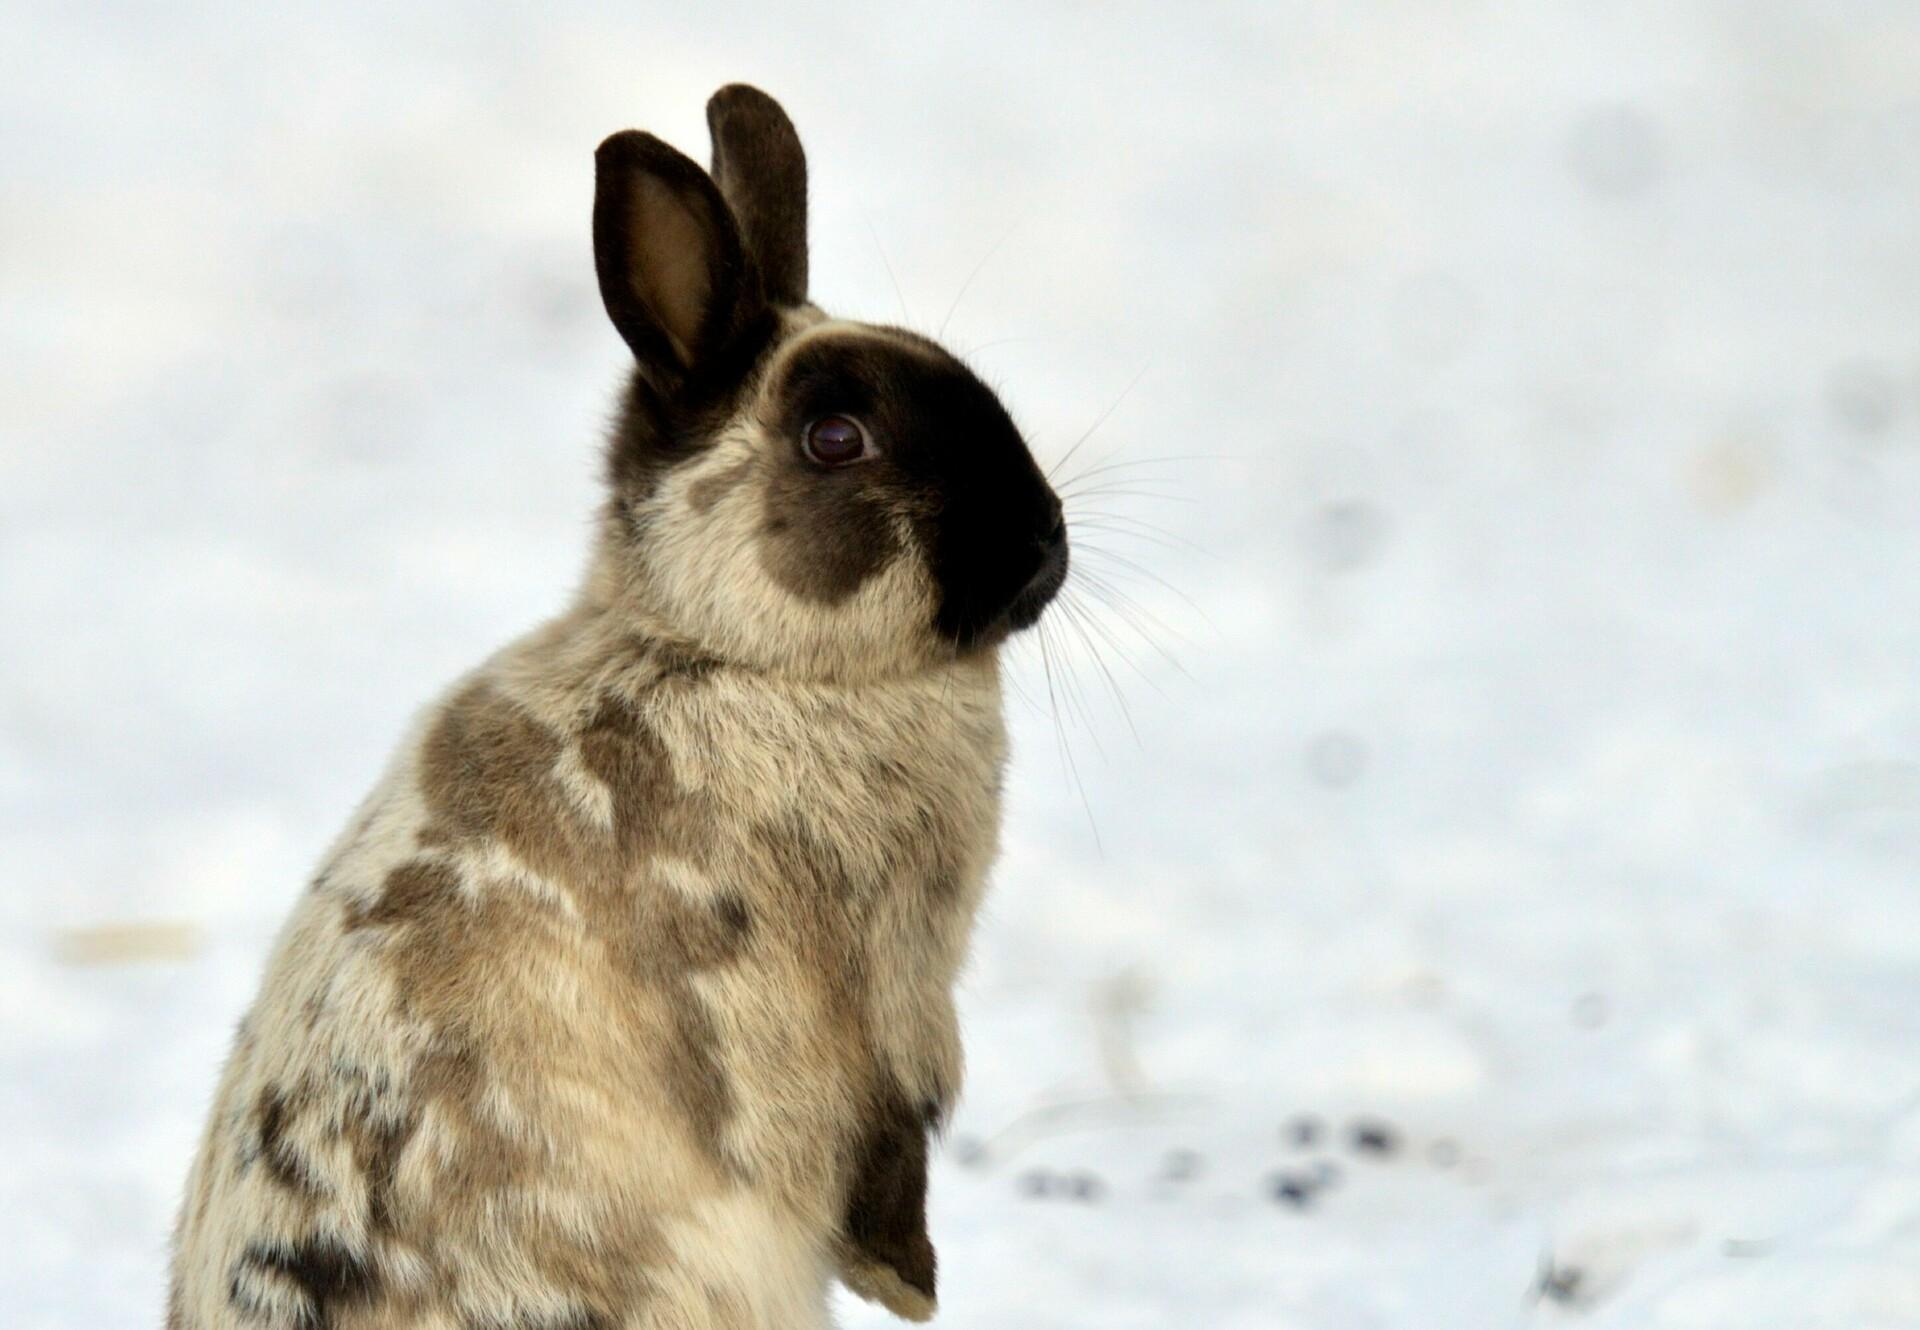 Rabbit in snow